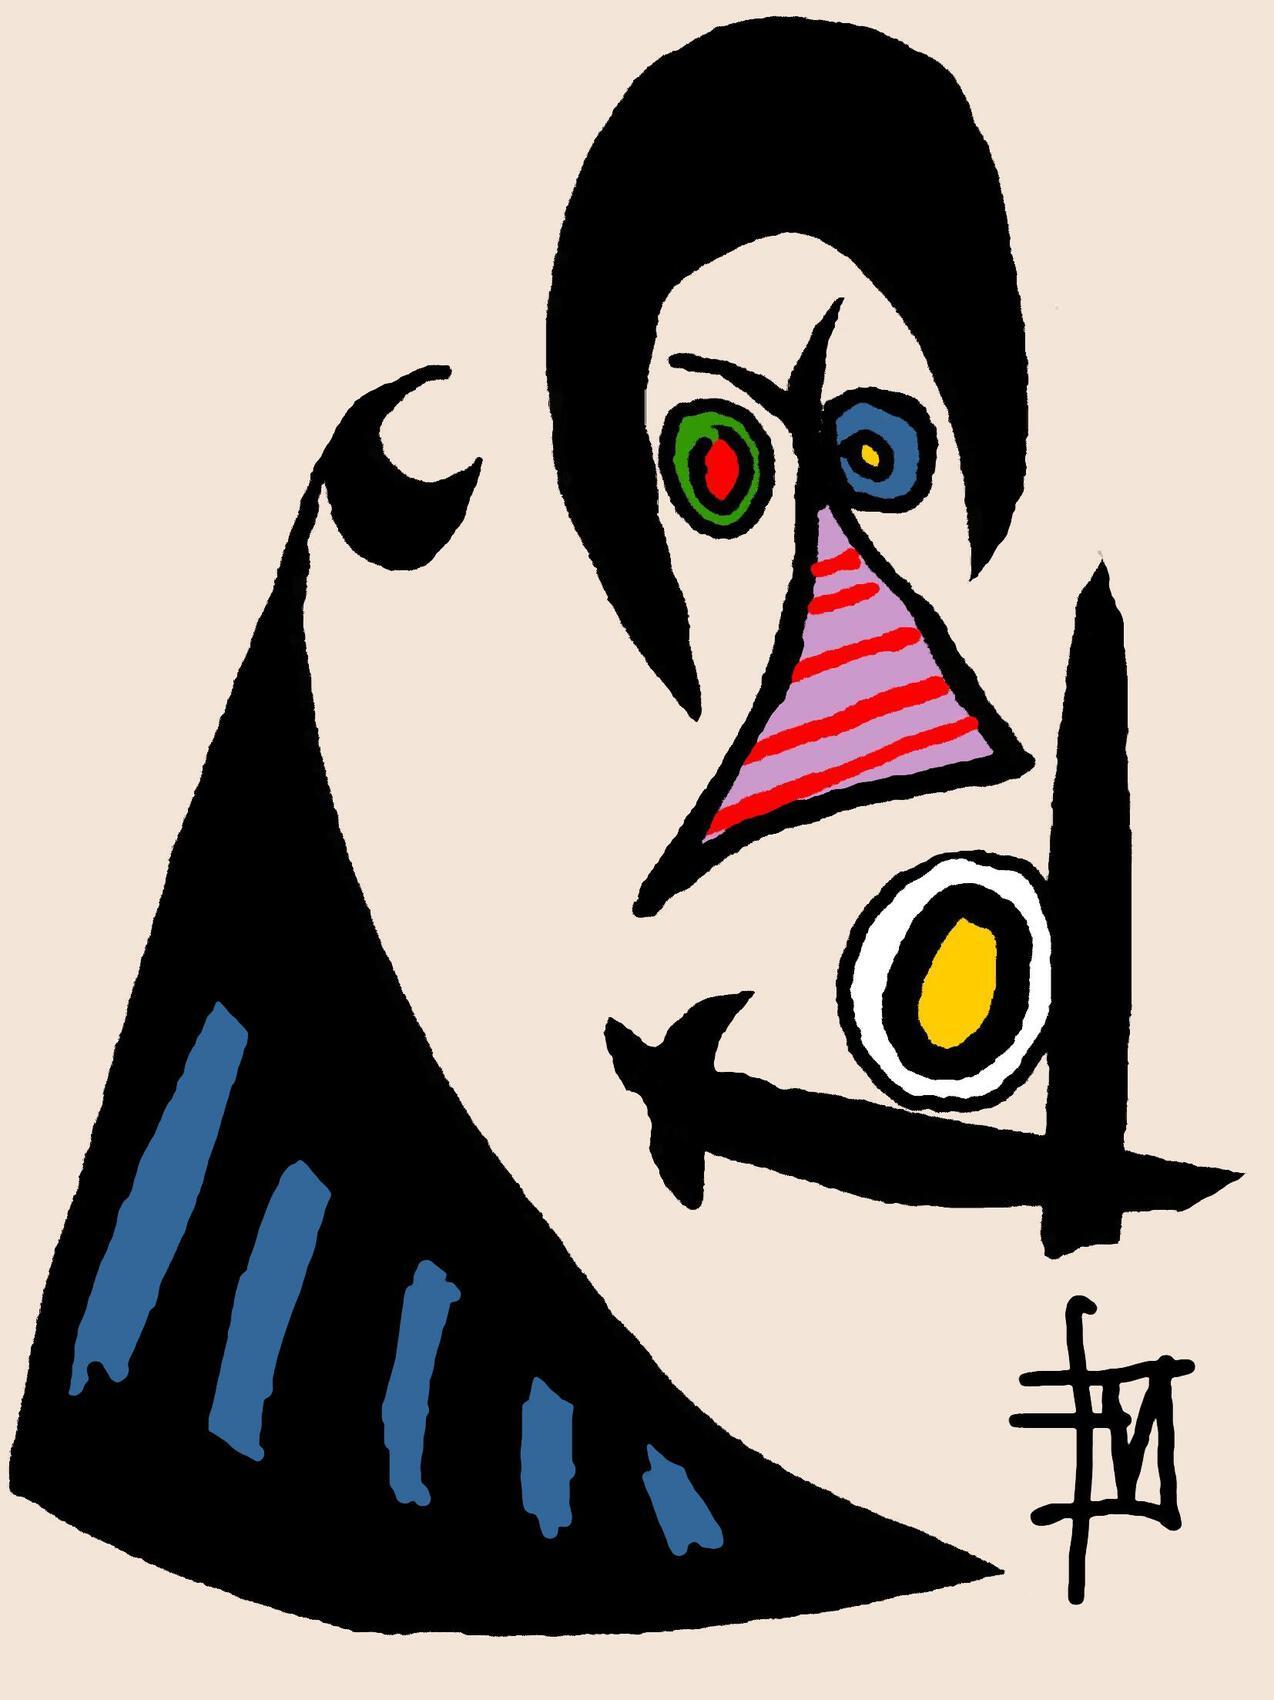 abstraction simiesque